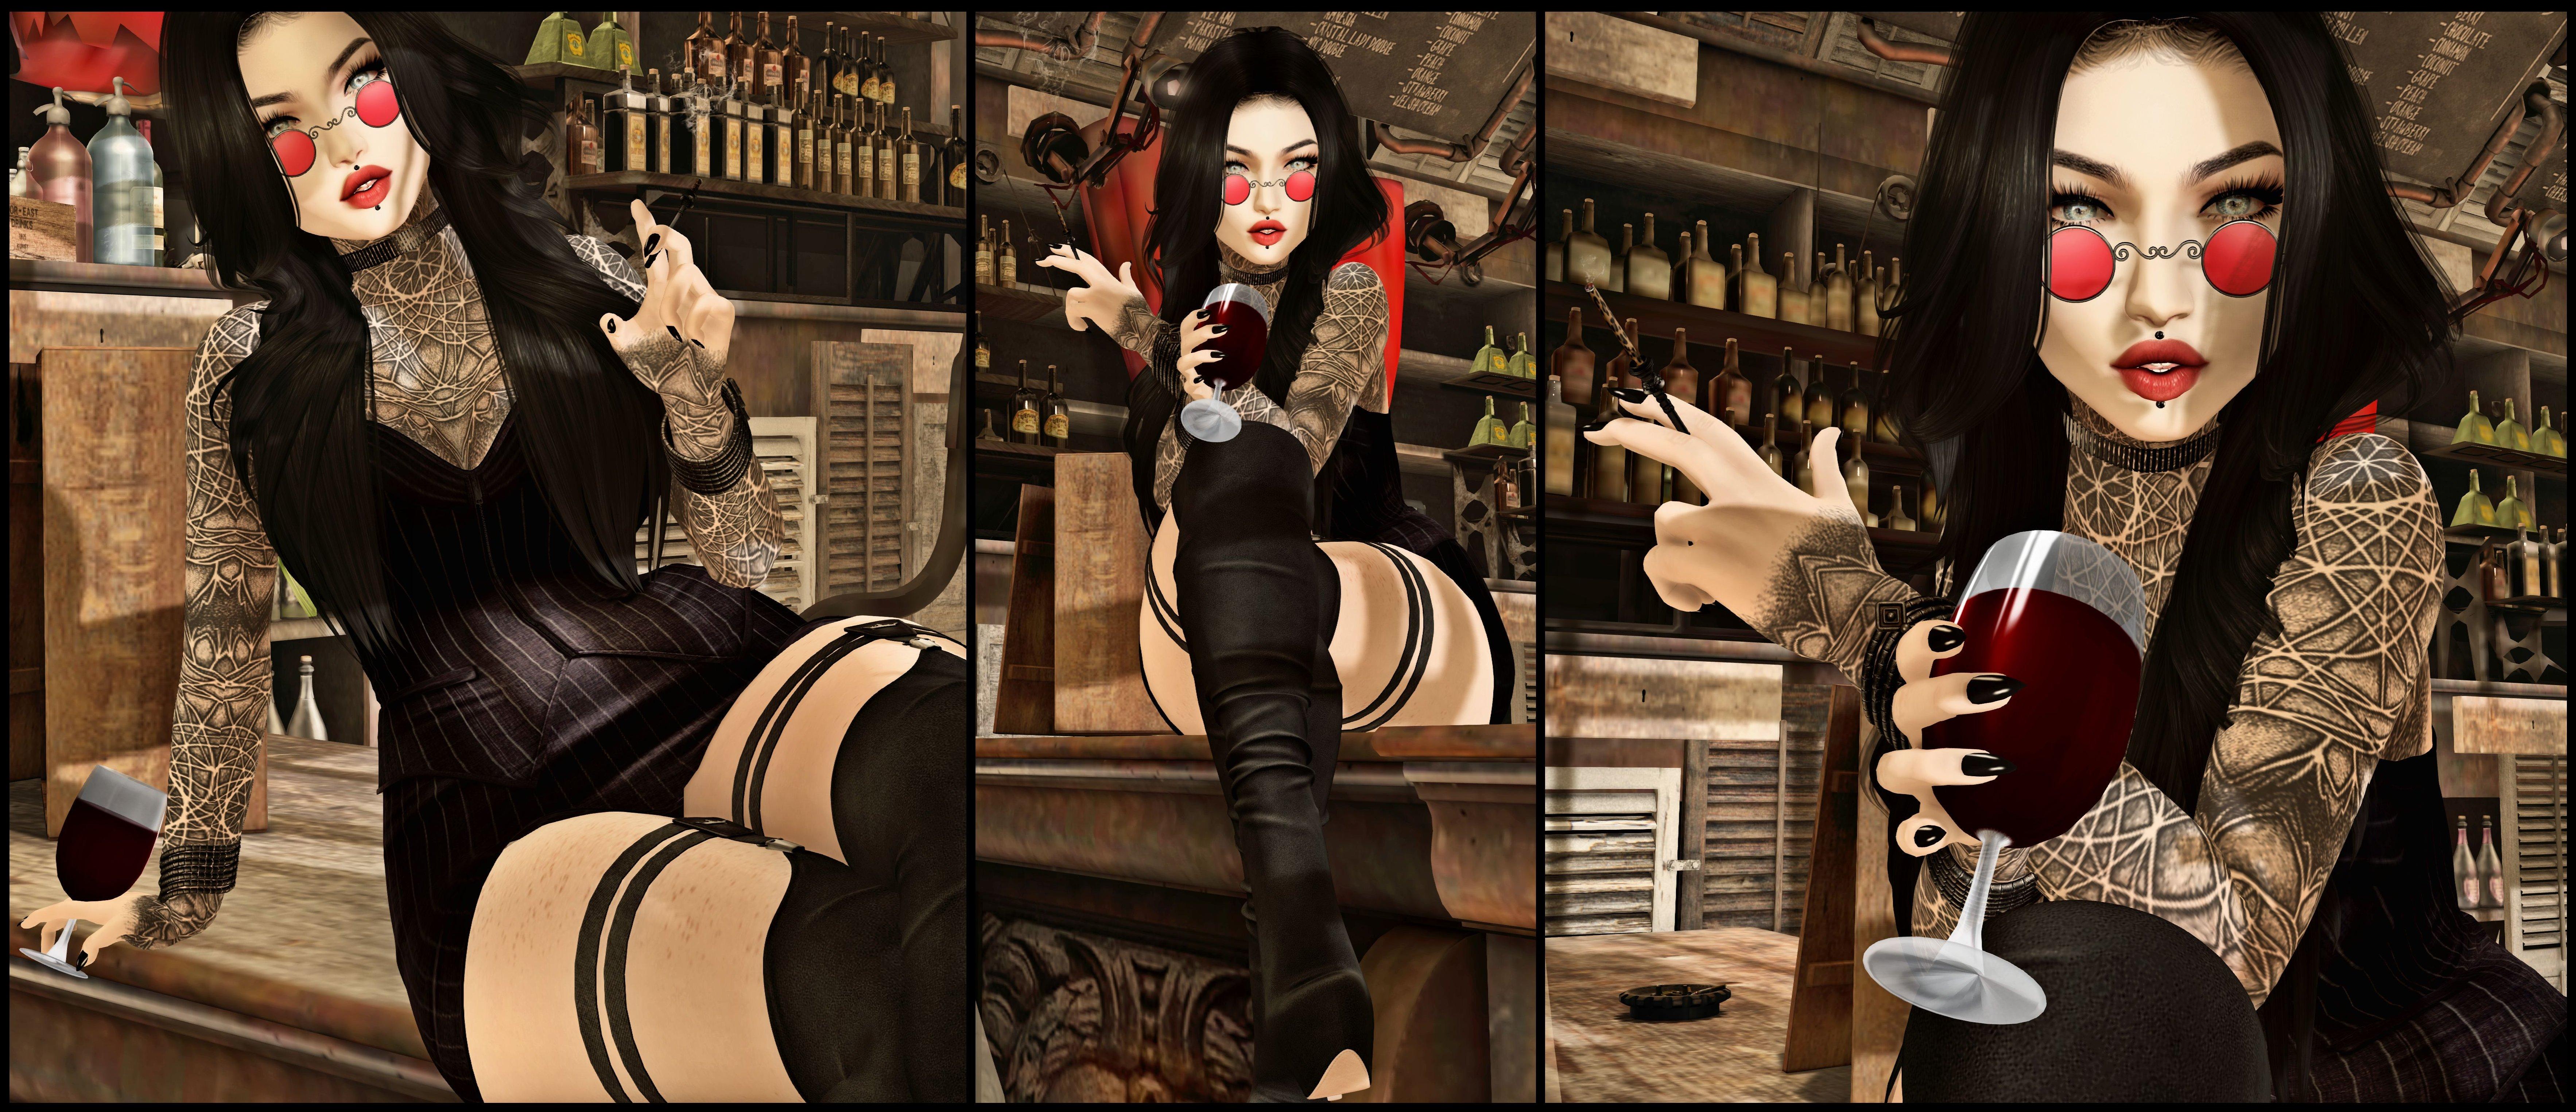 Wallpaper : woman, female, sexy, bar, wine, smoking